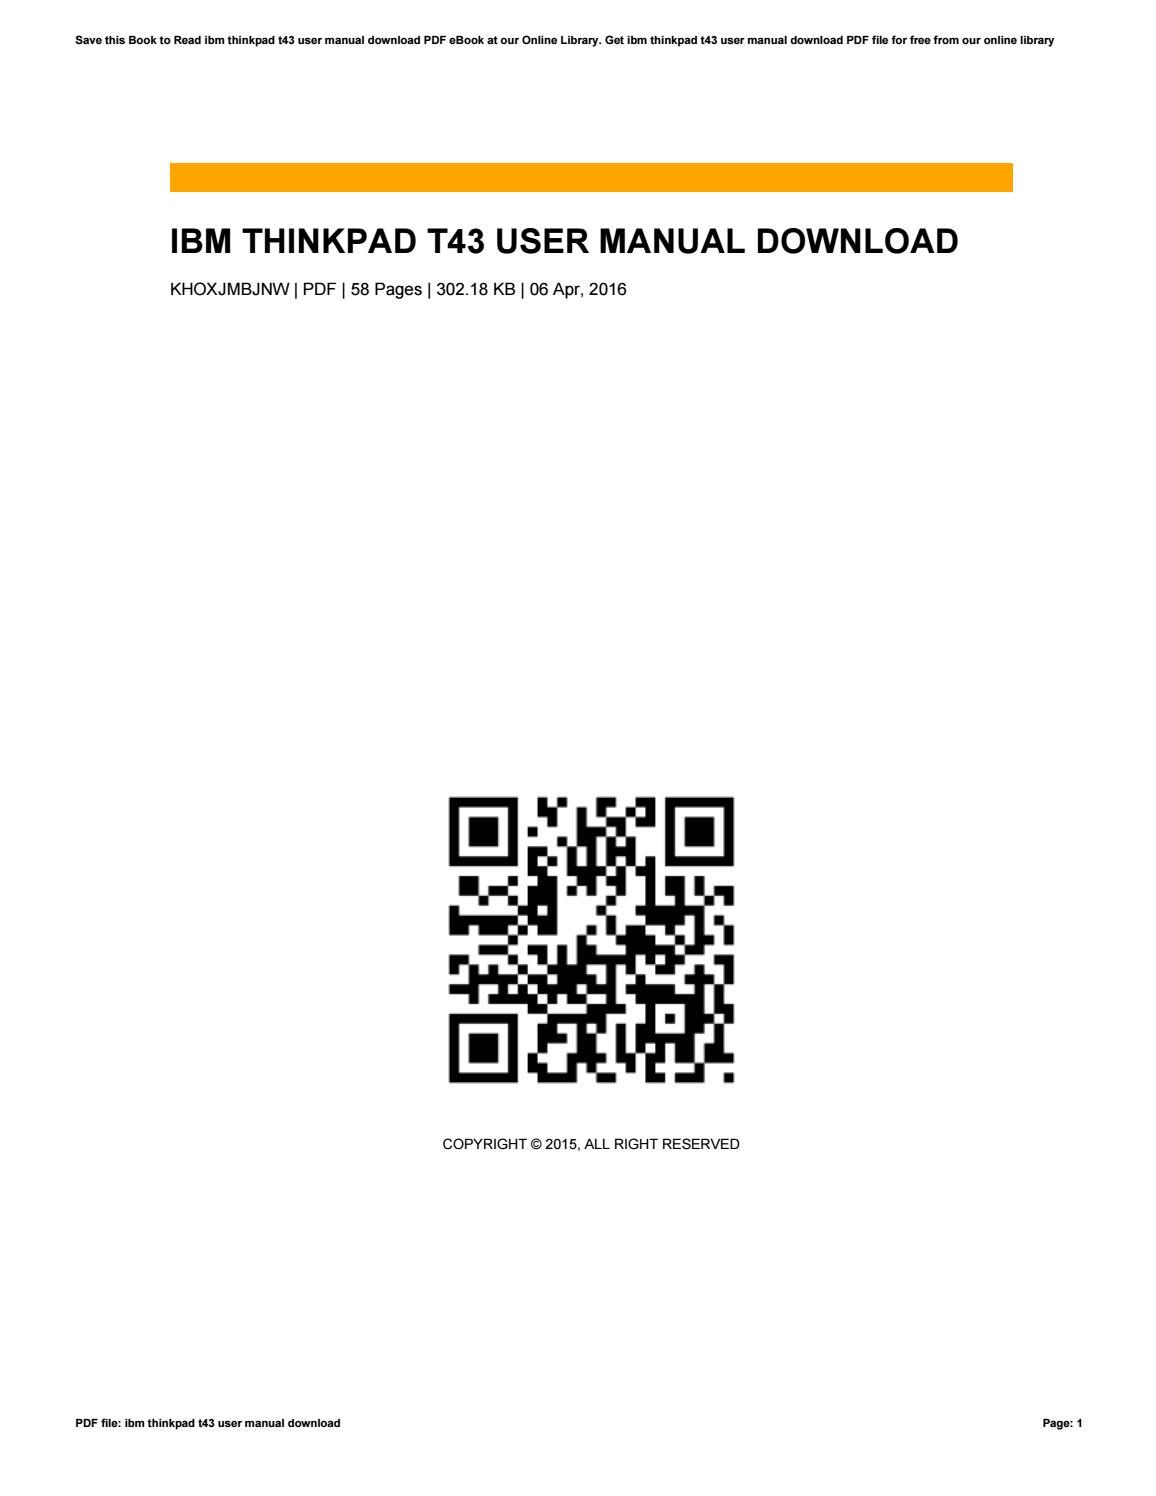 Ibm thinkpad t43 user manual download by marni38kumala issuu.